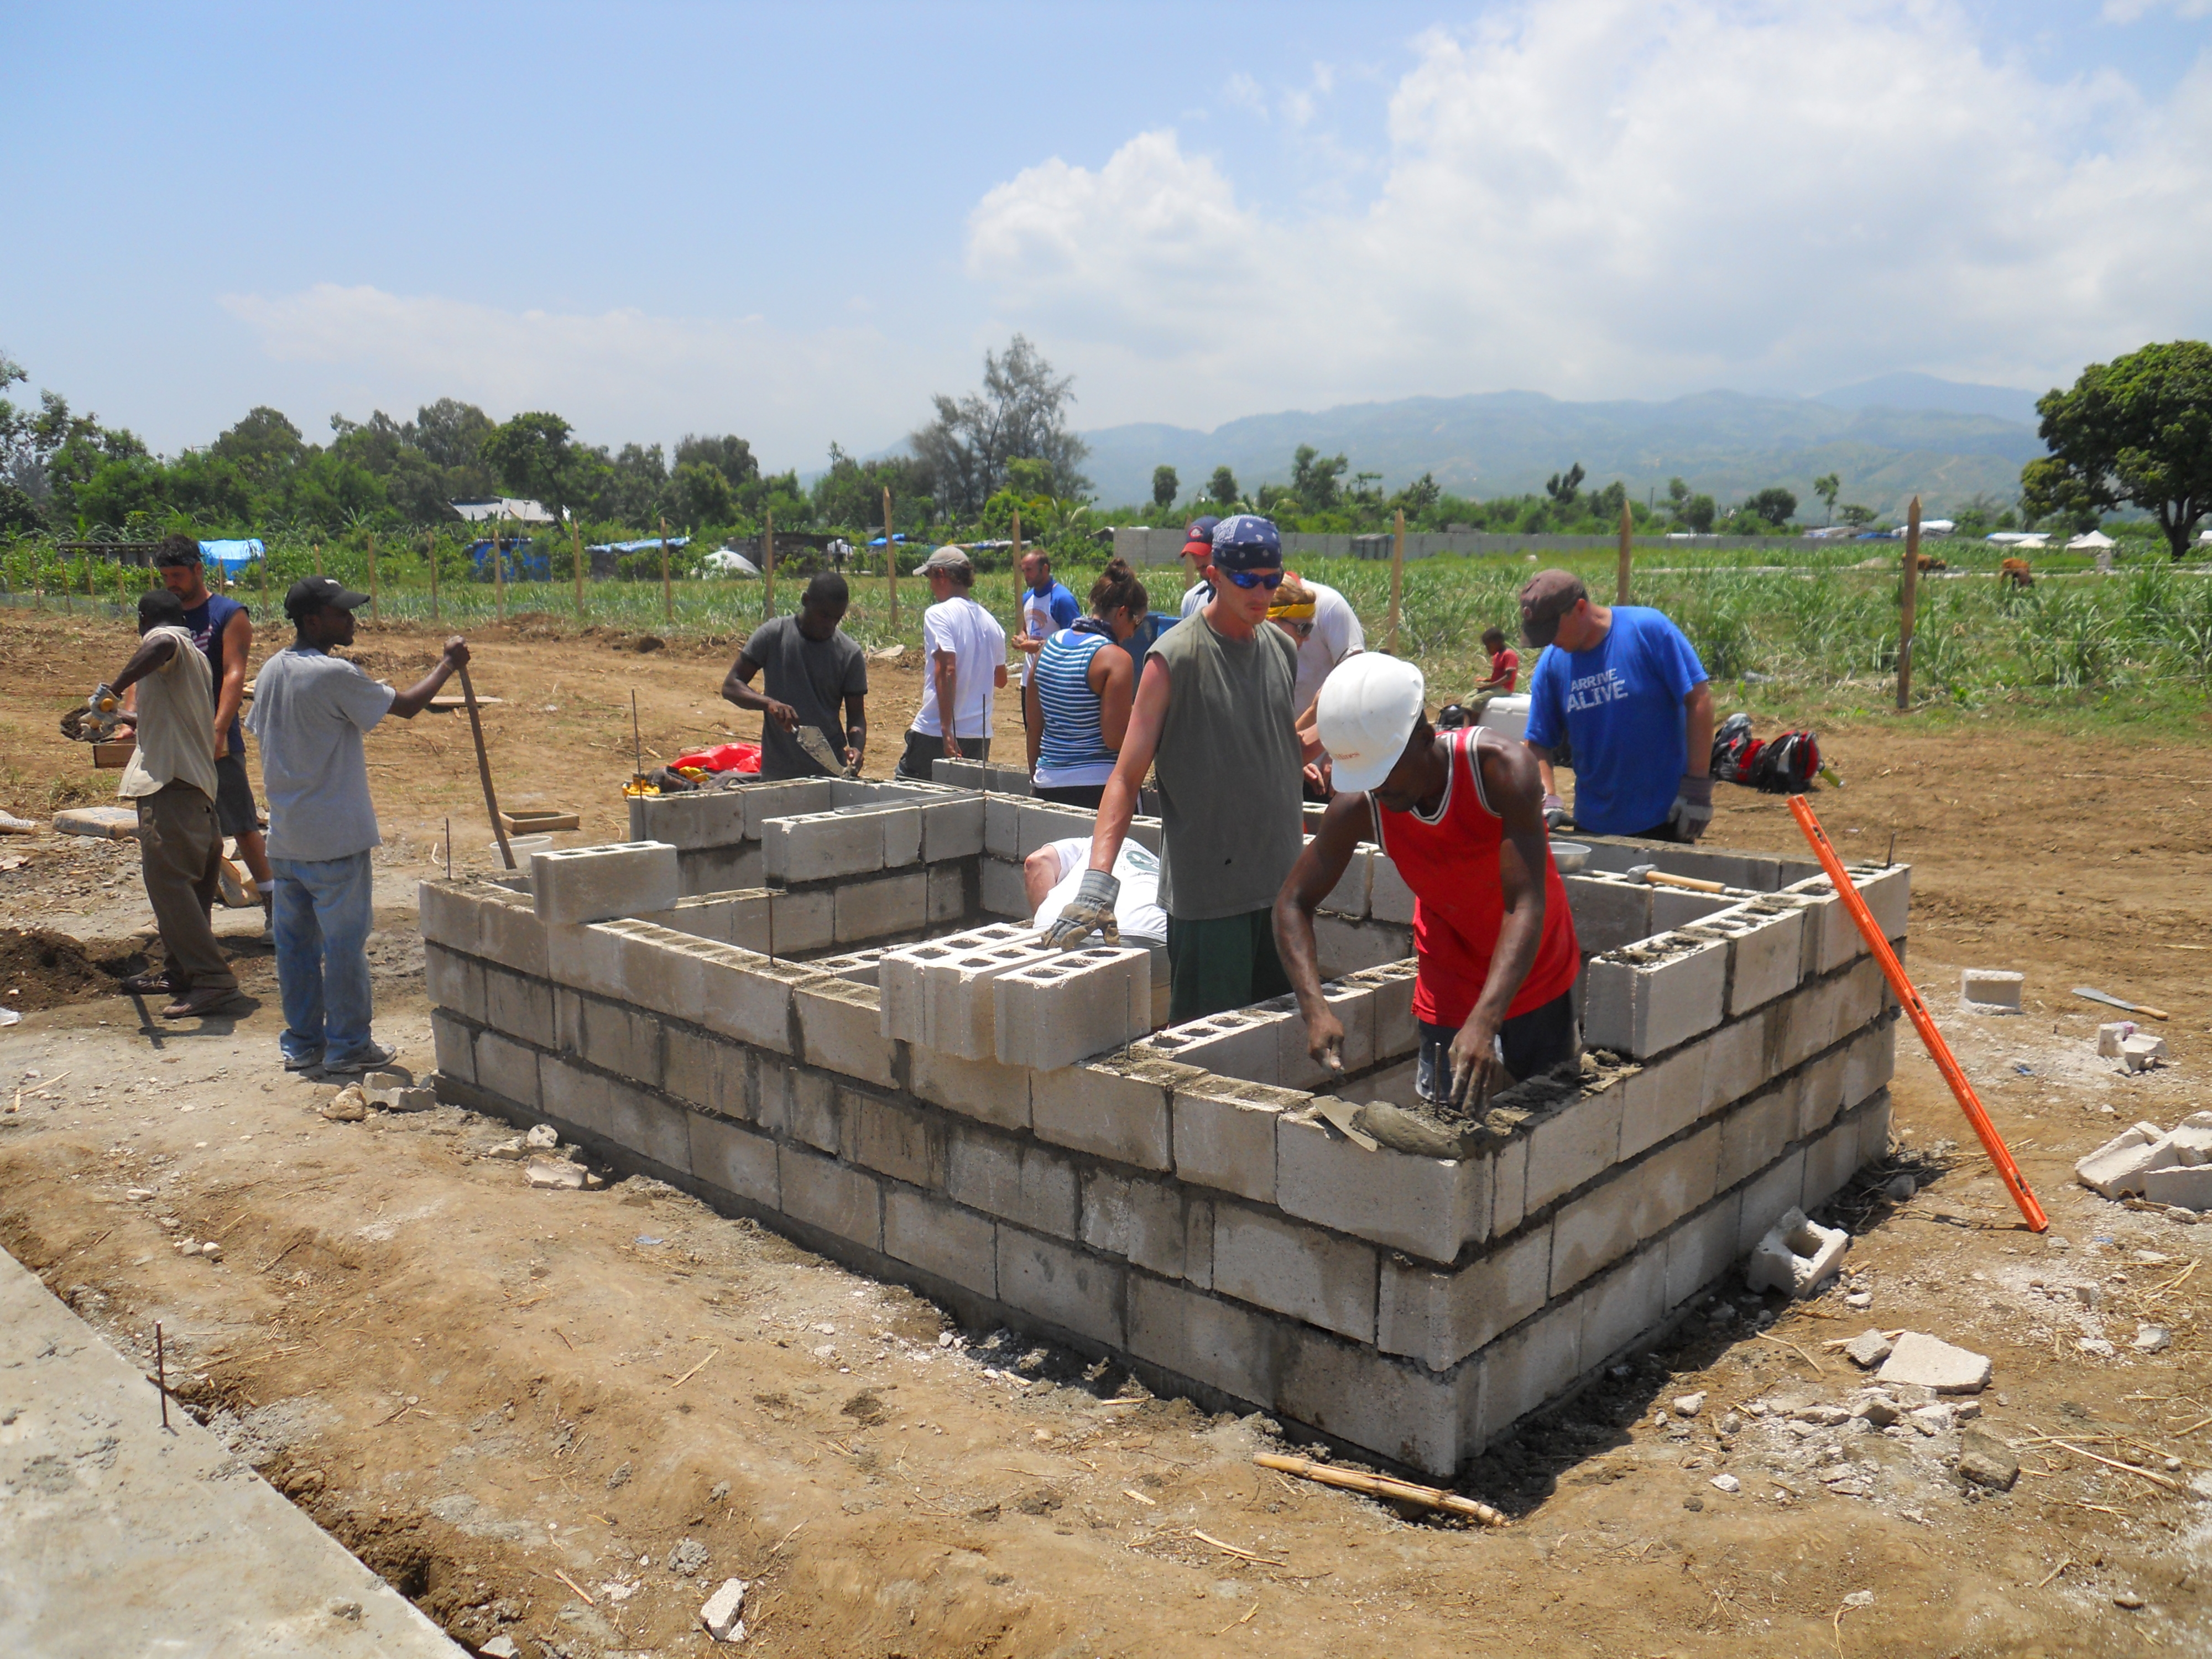 Heating up in Haiti